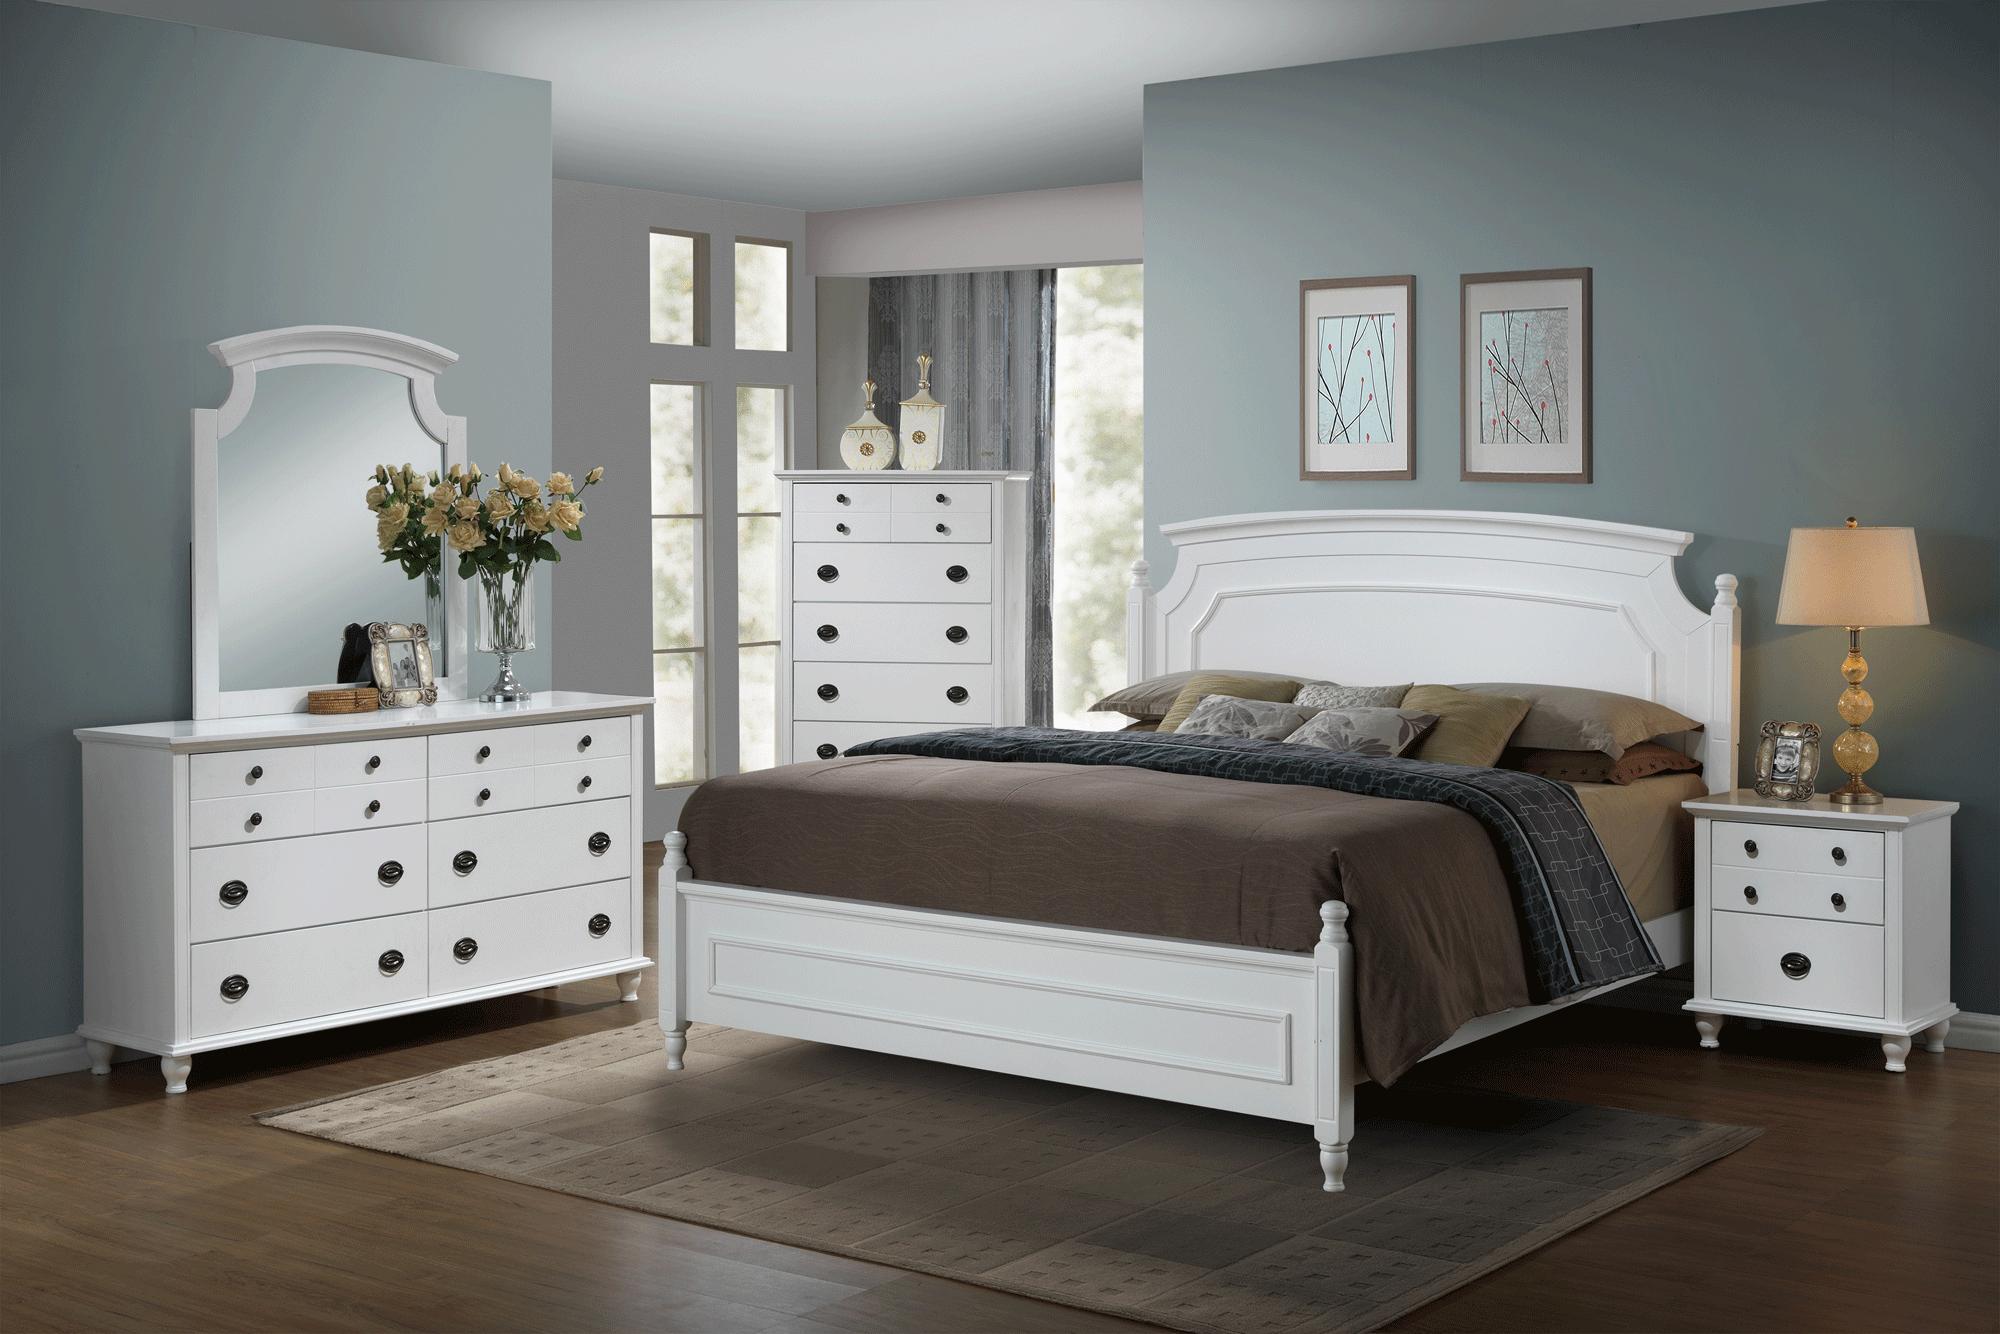 Global Bedroom Furniture Leila White Bedroom Set By Global Furniture